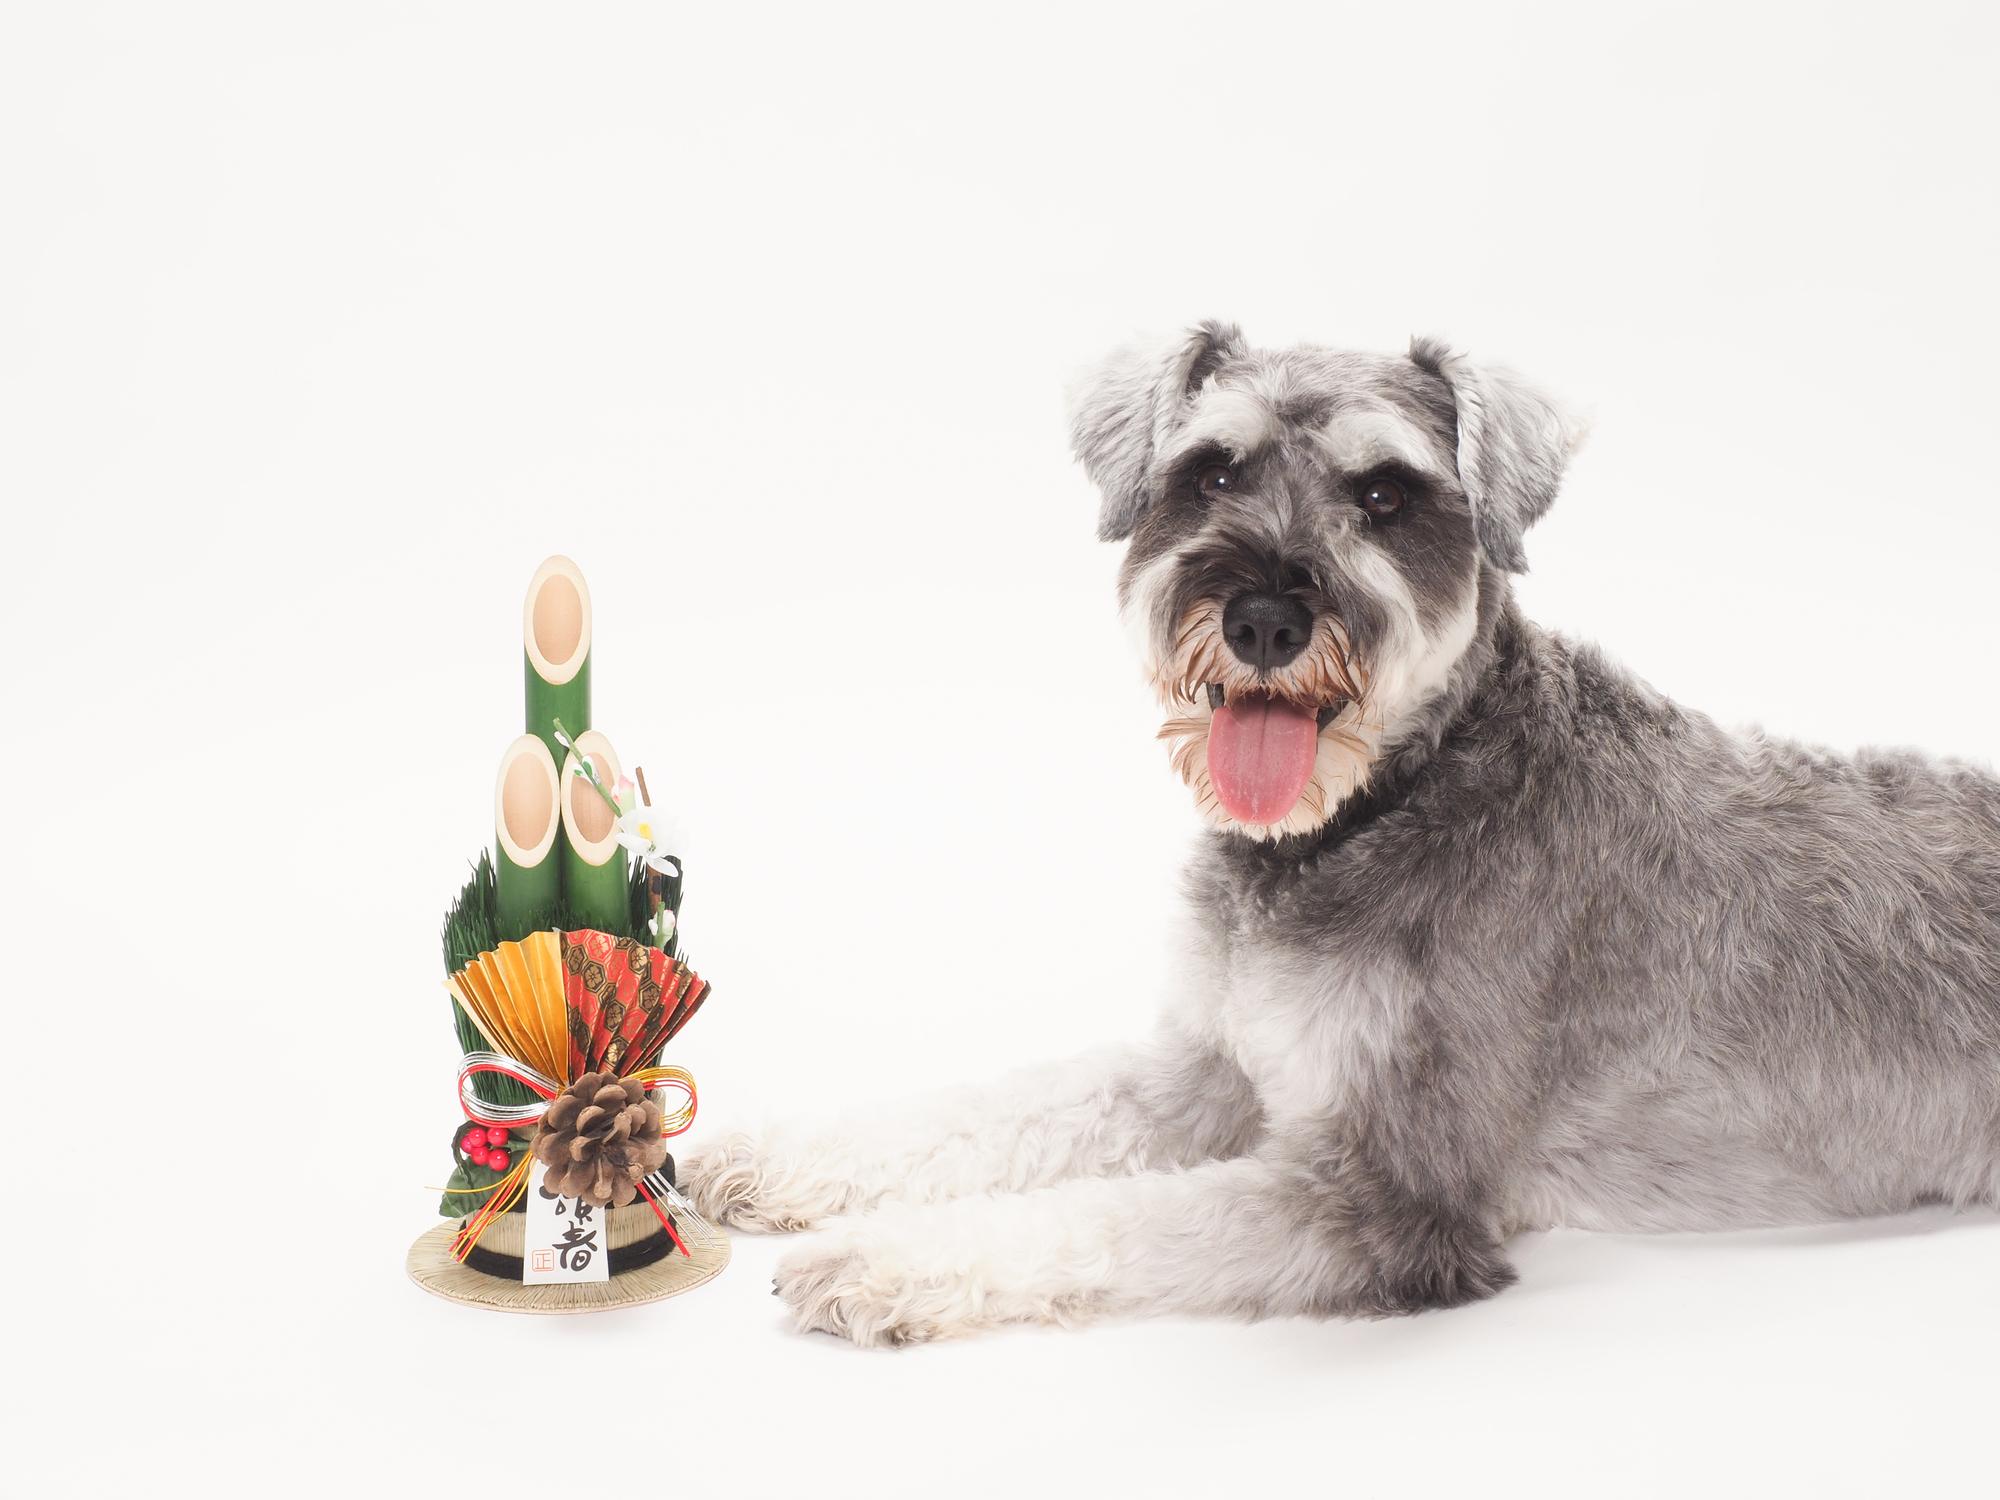 anifareがコロナ禍で保護依頼急増を受けて保護犬譲渡会を開催